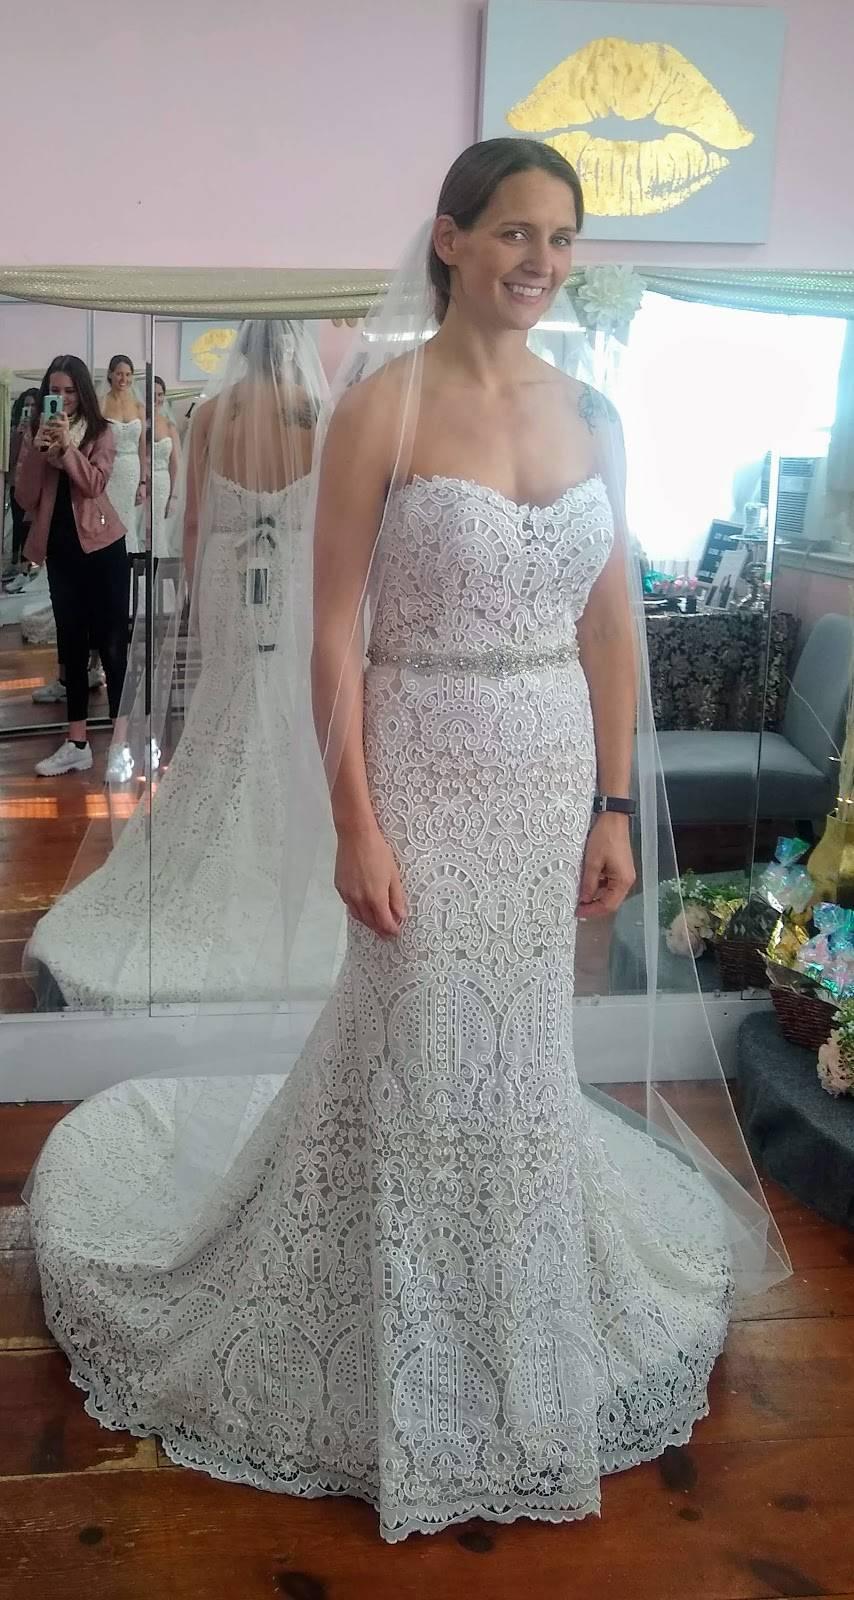 Breathless Bridal - clothing store    Photo 4 of 6   Address: 1741 US-41, Ridgetop, TN 37152, USA   Phone: (615) 855-0644